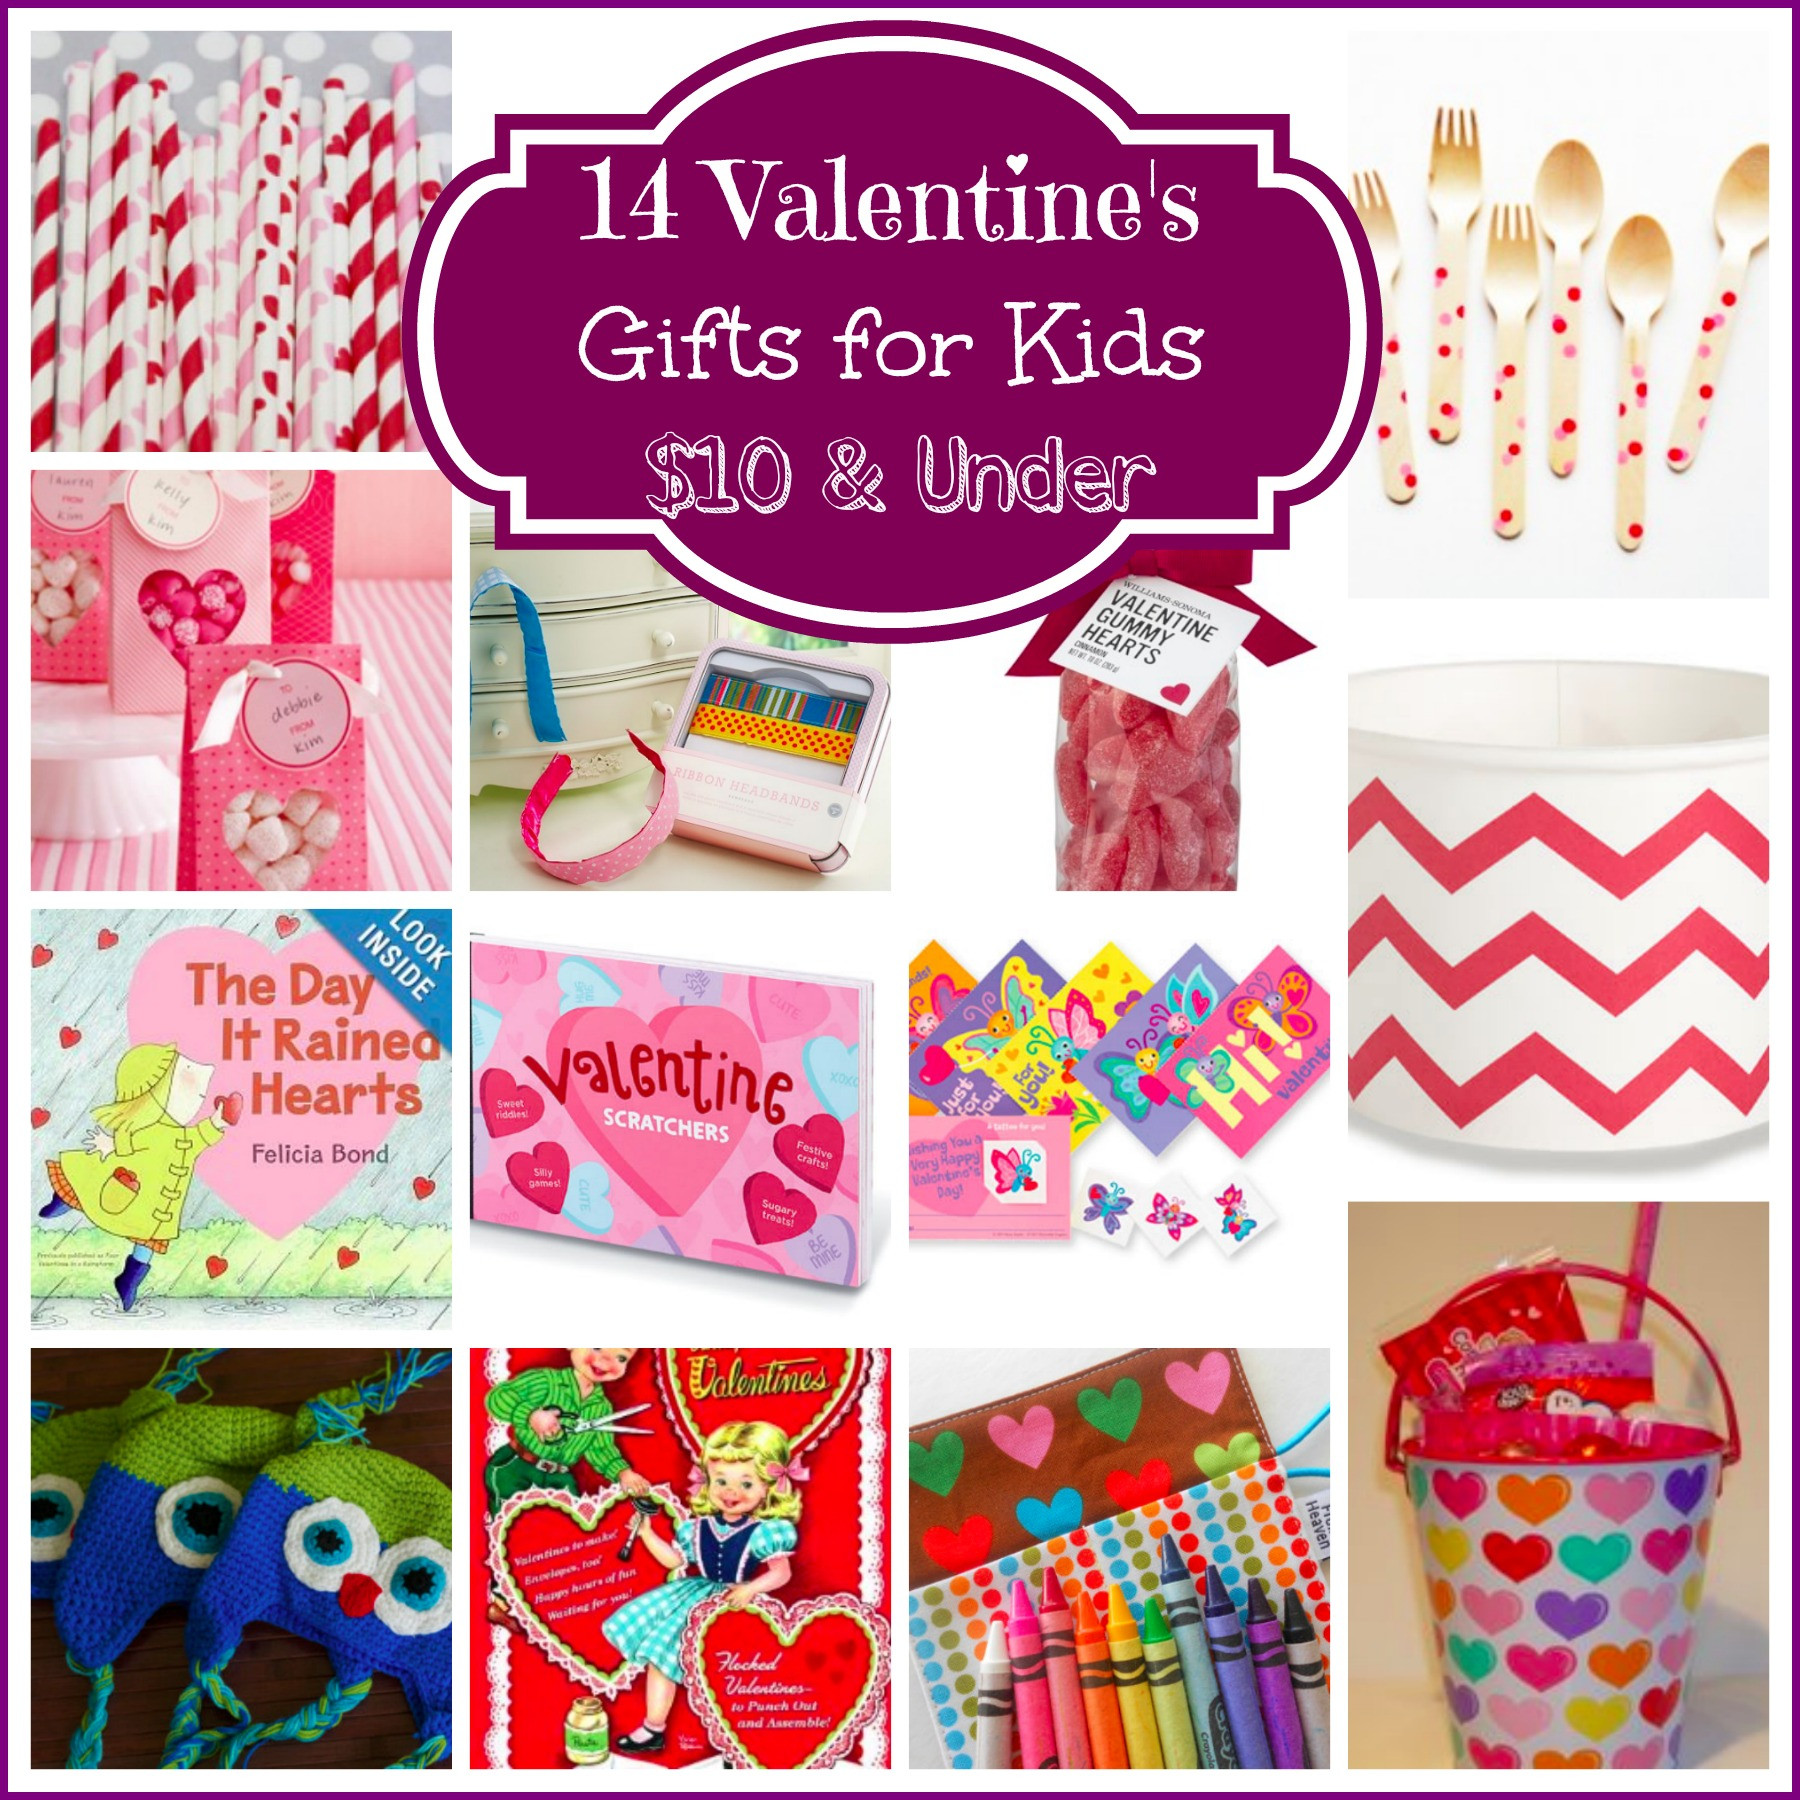 Toddler Valentines Day Gift Ideas  14 Valentine's Day Gifts for Kids $10 & Under